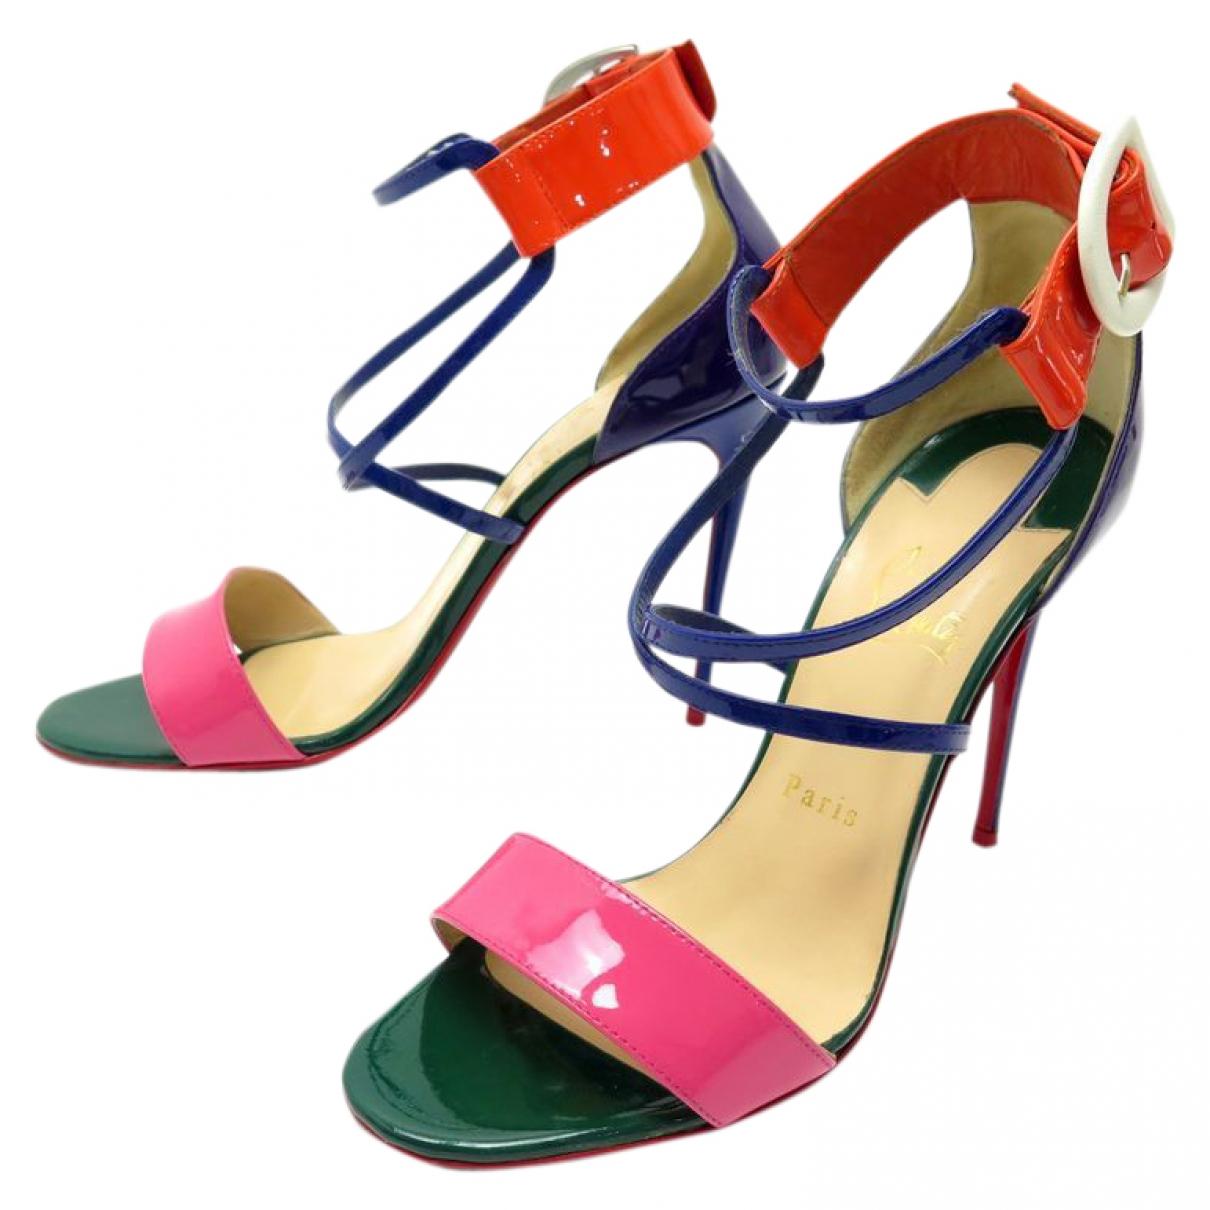 Sandalias de Charol Christian Louboutin